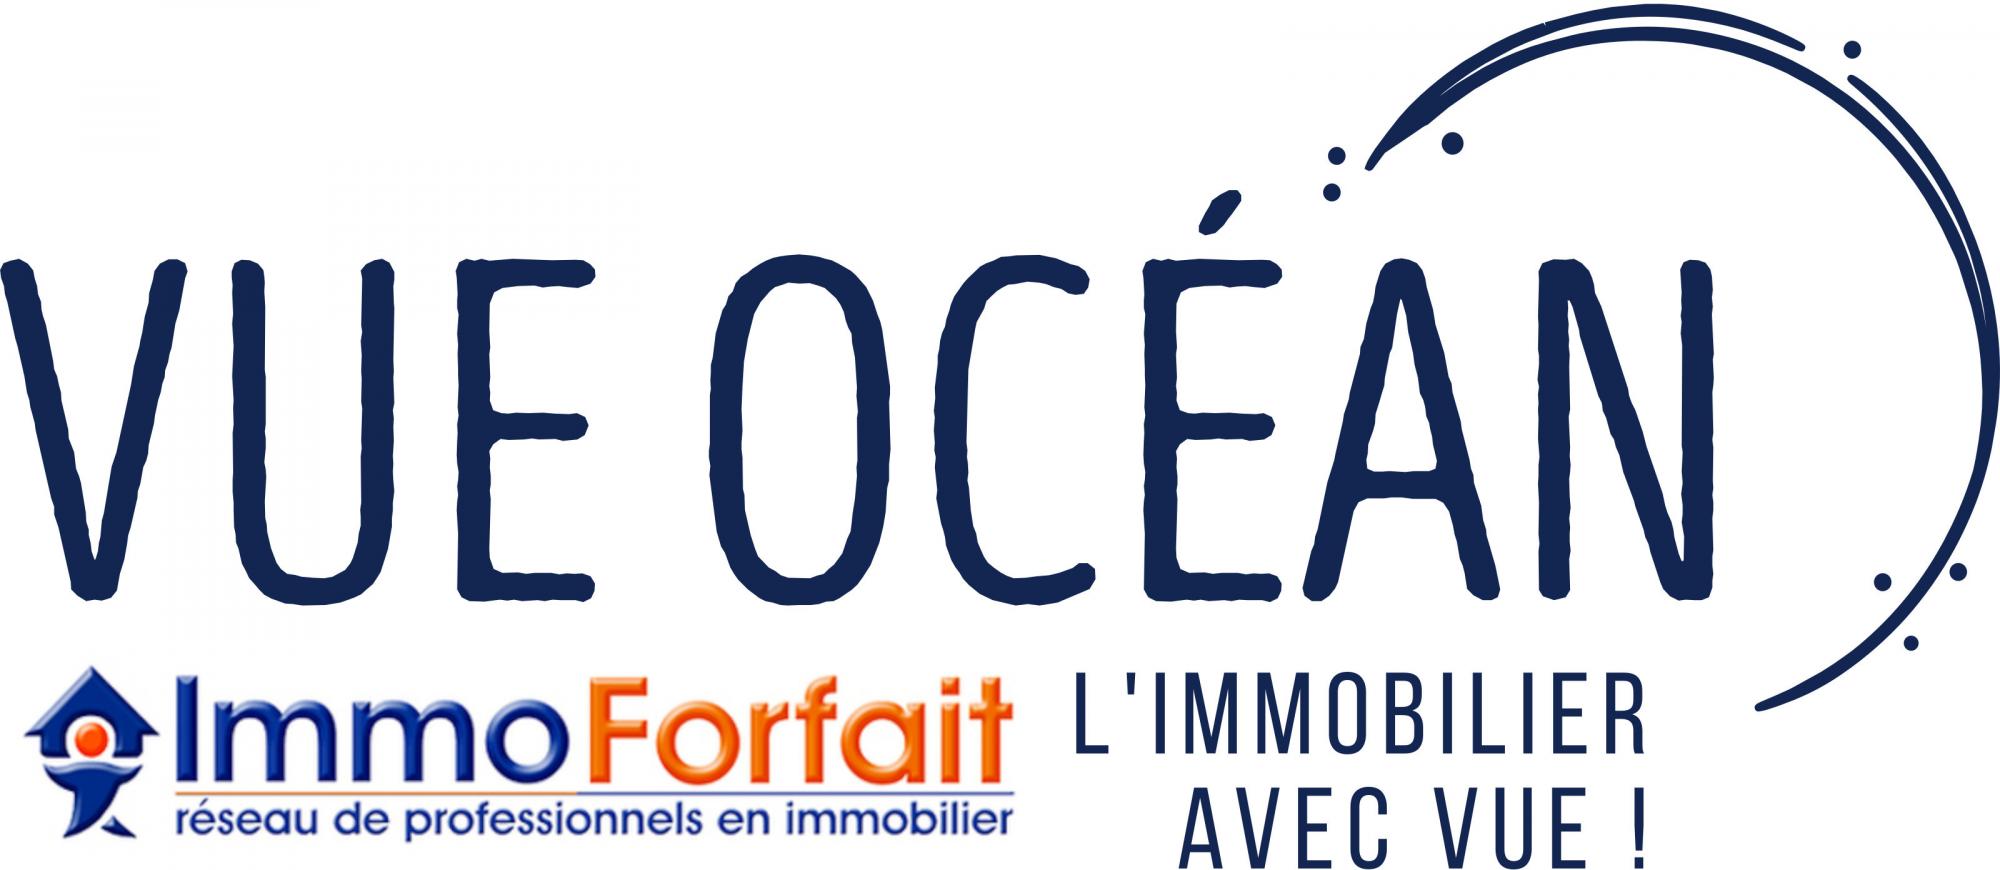 Agence immobilière Vue Océan RSAC 494 264 526